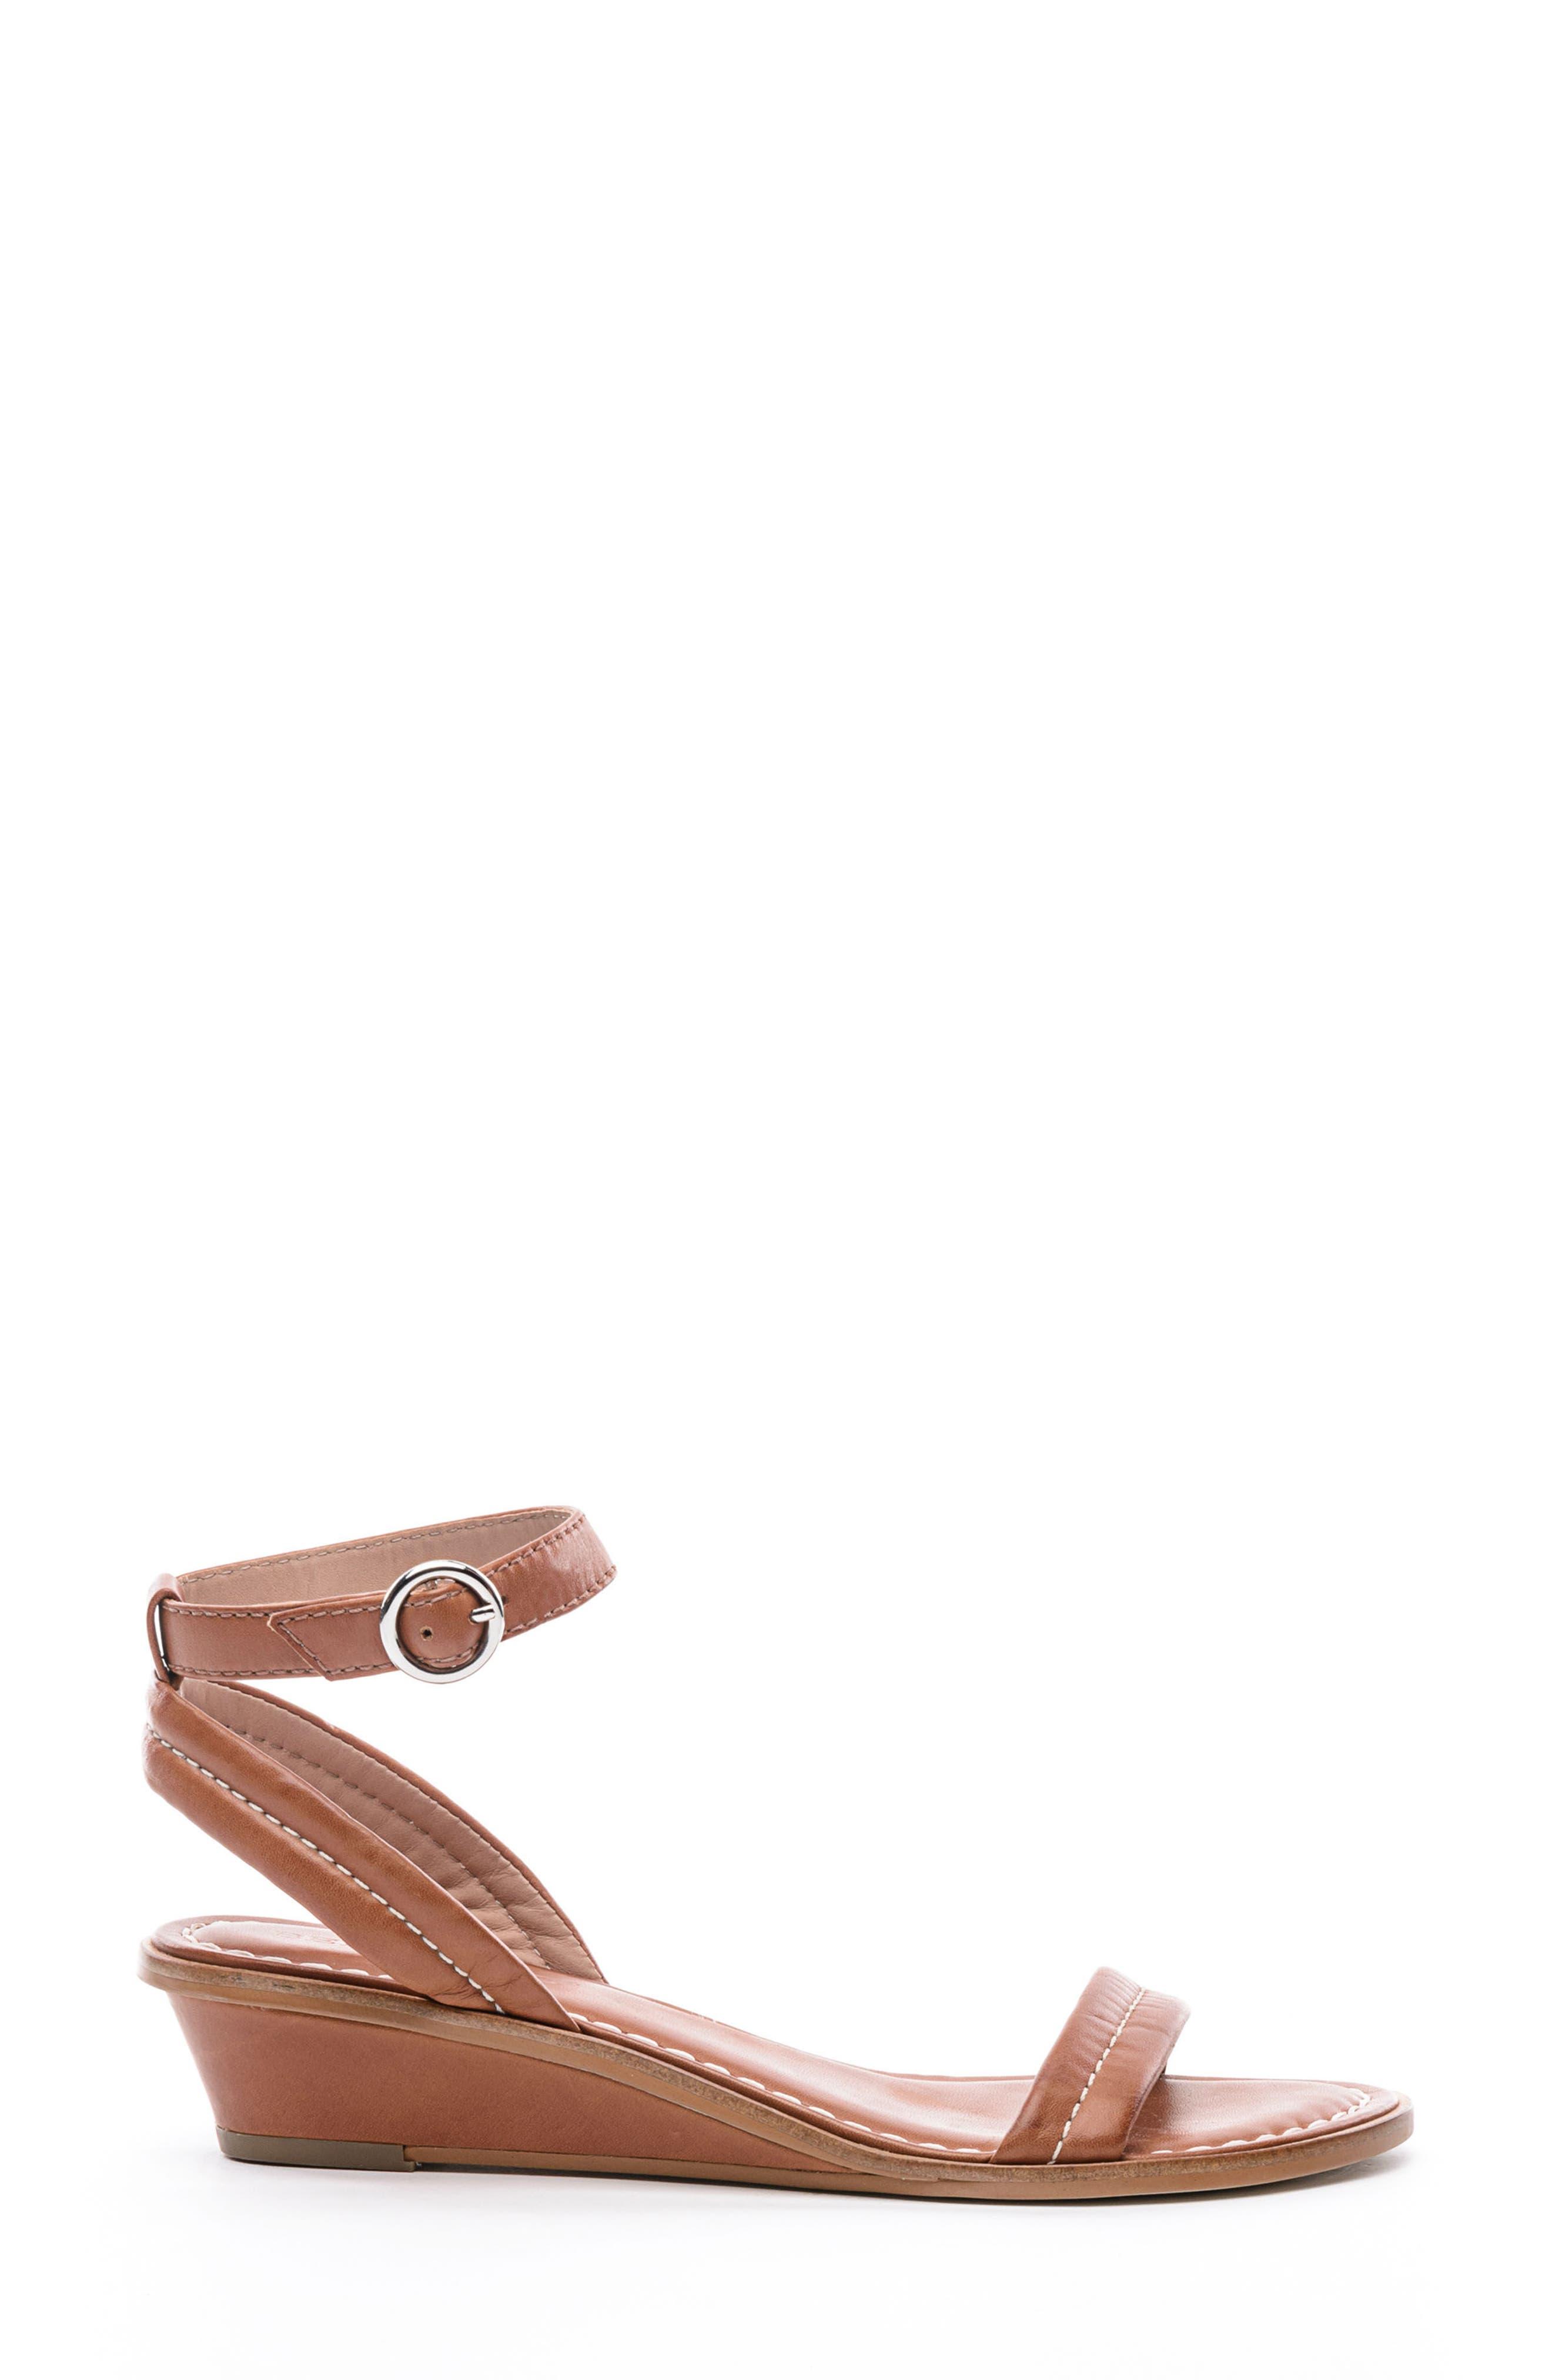 BERNARDO, Catherine Ankle Strap Sandal, Alternate thumbnail 3, color, LUGGAGE BROWN ANTIQUE